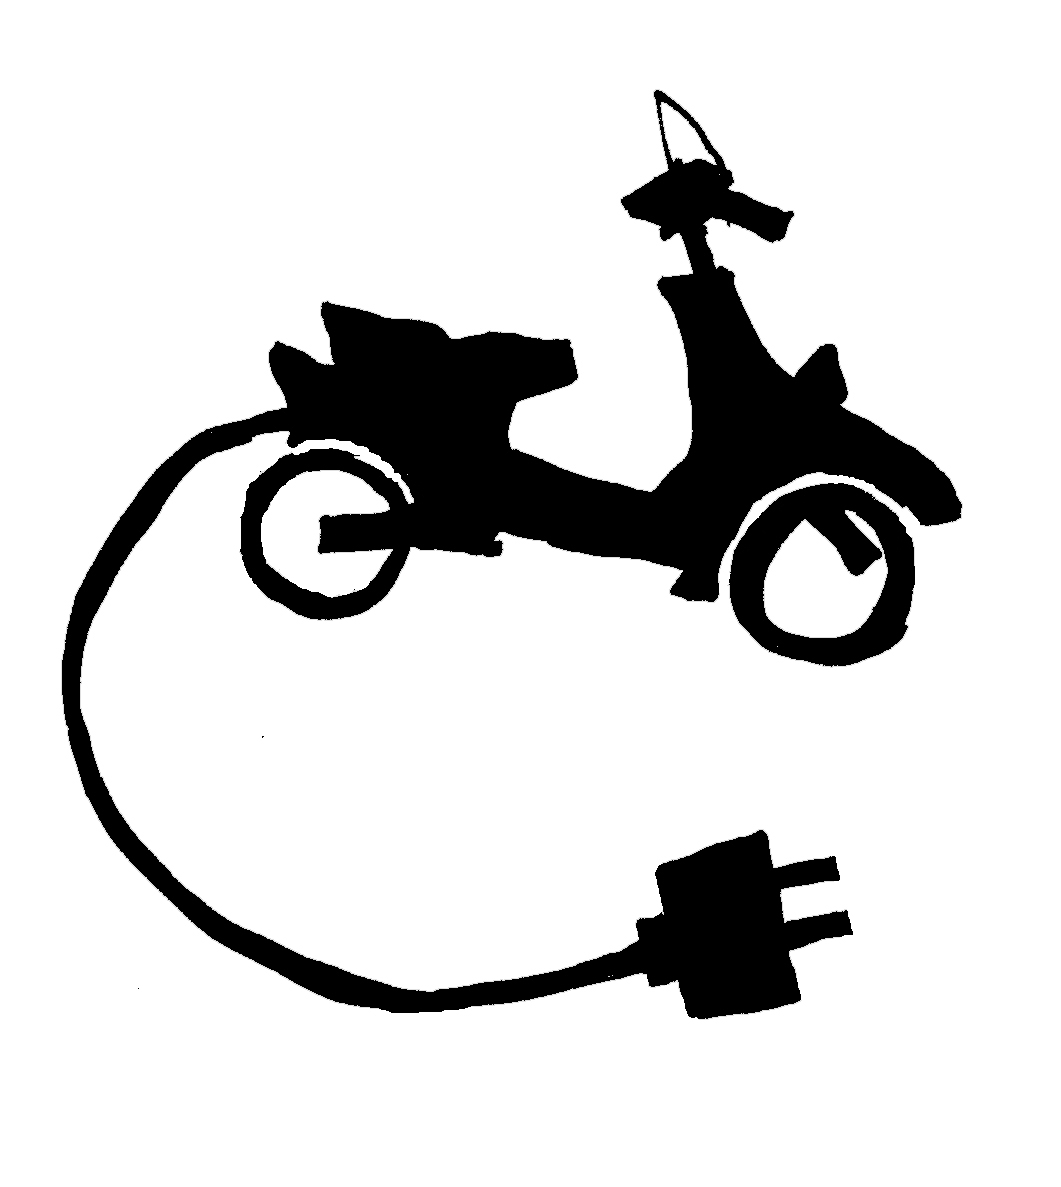 Canadian Ebike Law